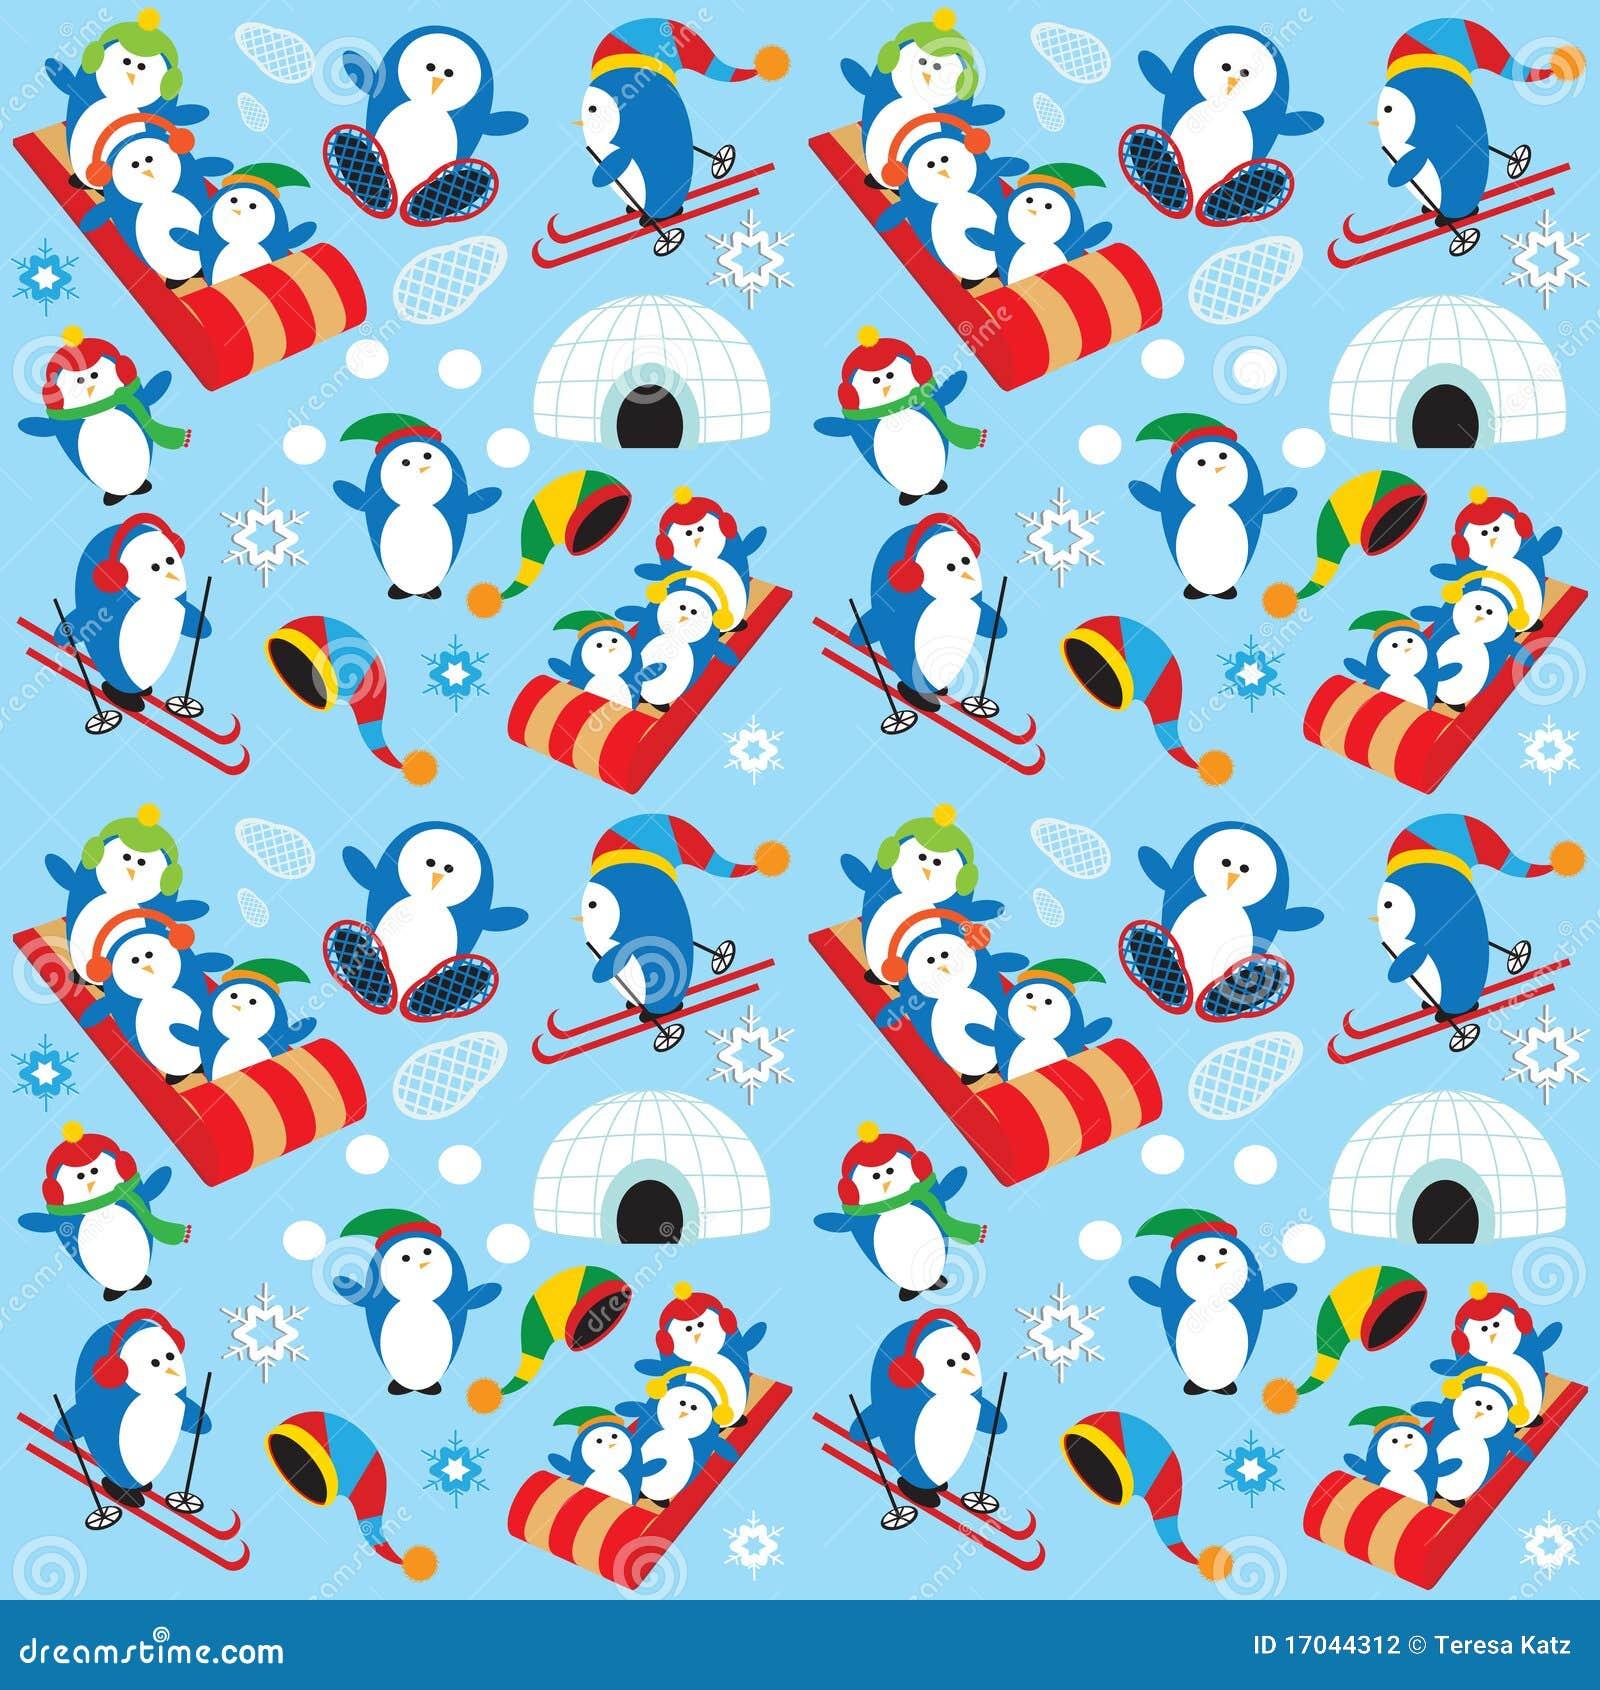 Penguin Wallpaper Stock Vector Illustration Of Village